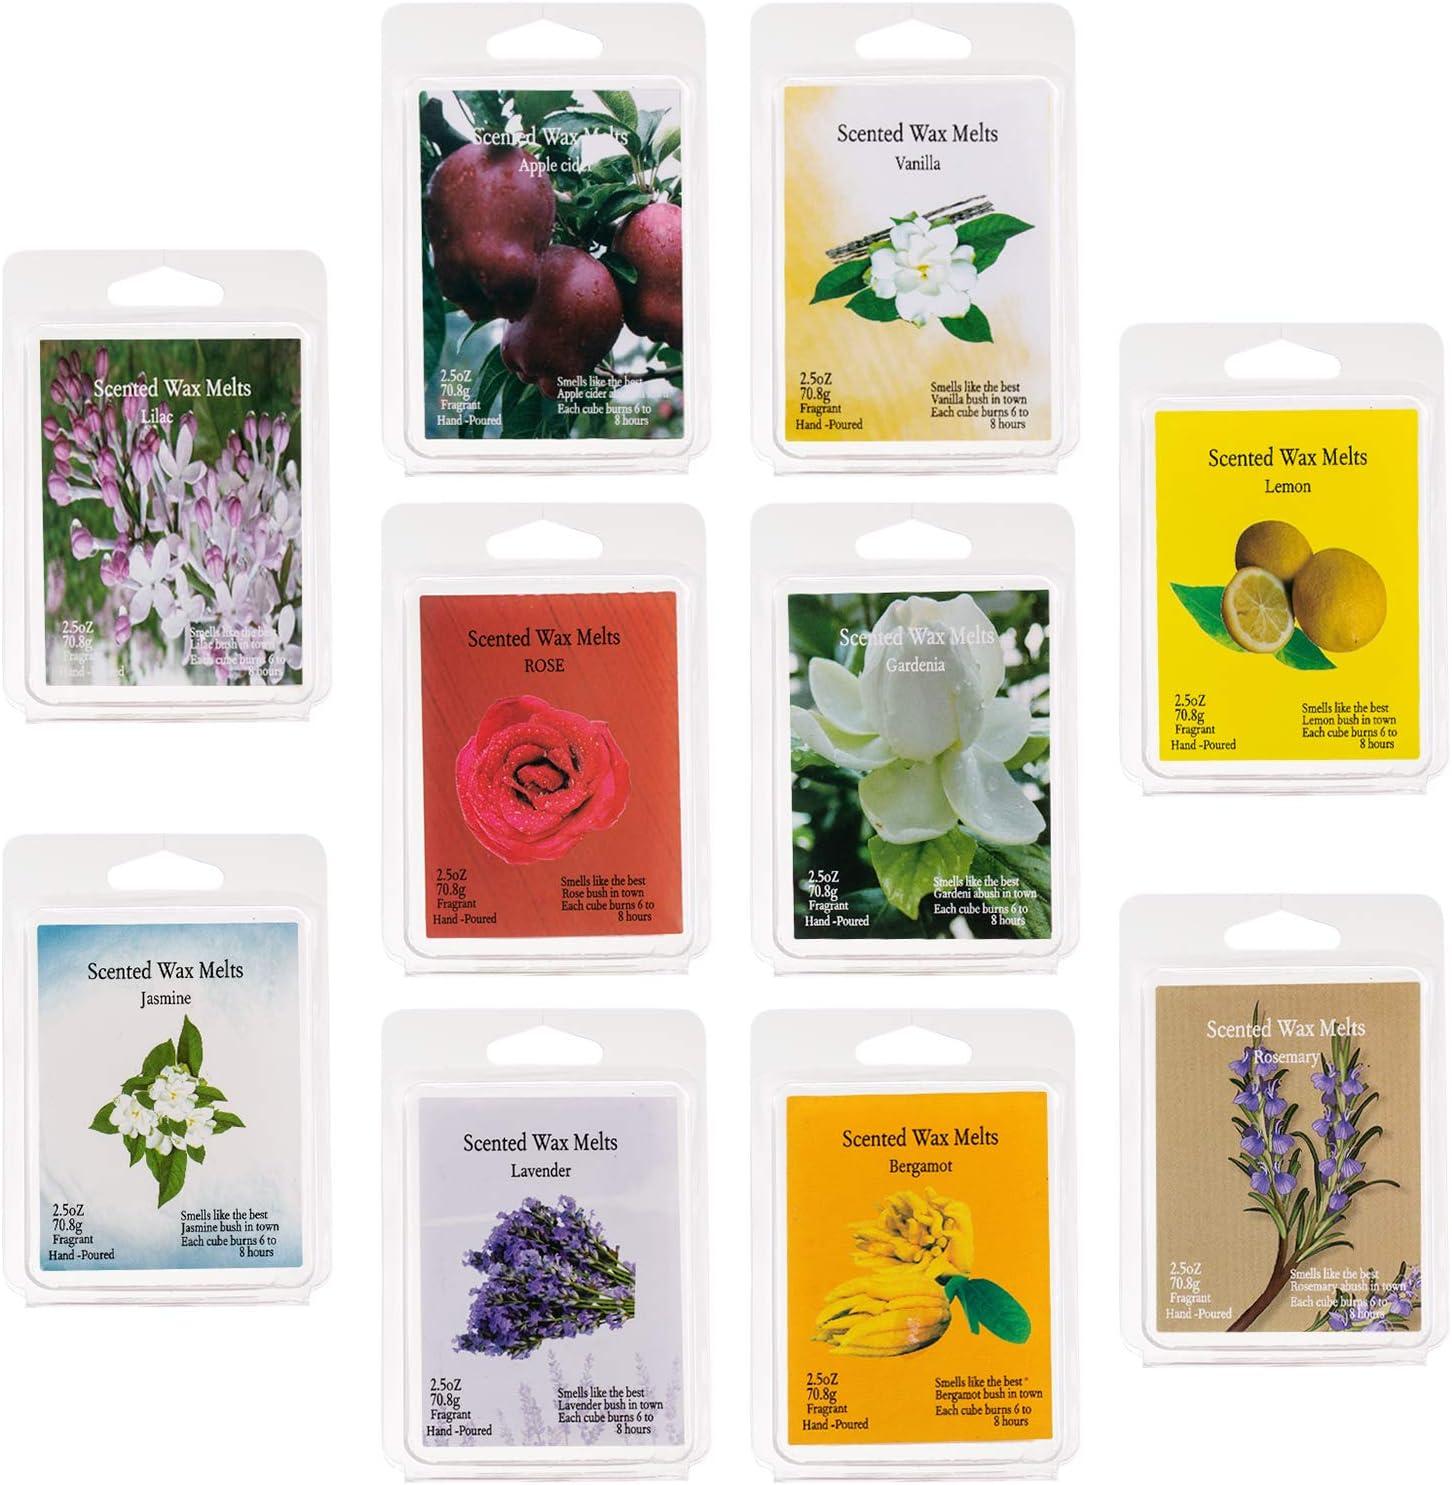 Scented Wax Melts -Set of 10 (2.5 oz) Assorted Wax Warmer Cubes/Tarts - Lemon, Lavender, Lilac, Rose, Jasmine, Vanilla, Bergamot, Rosemary, Apple, Gardenia